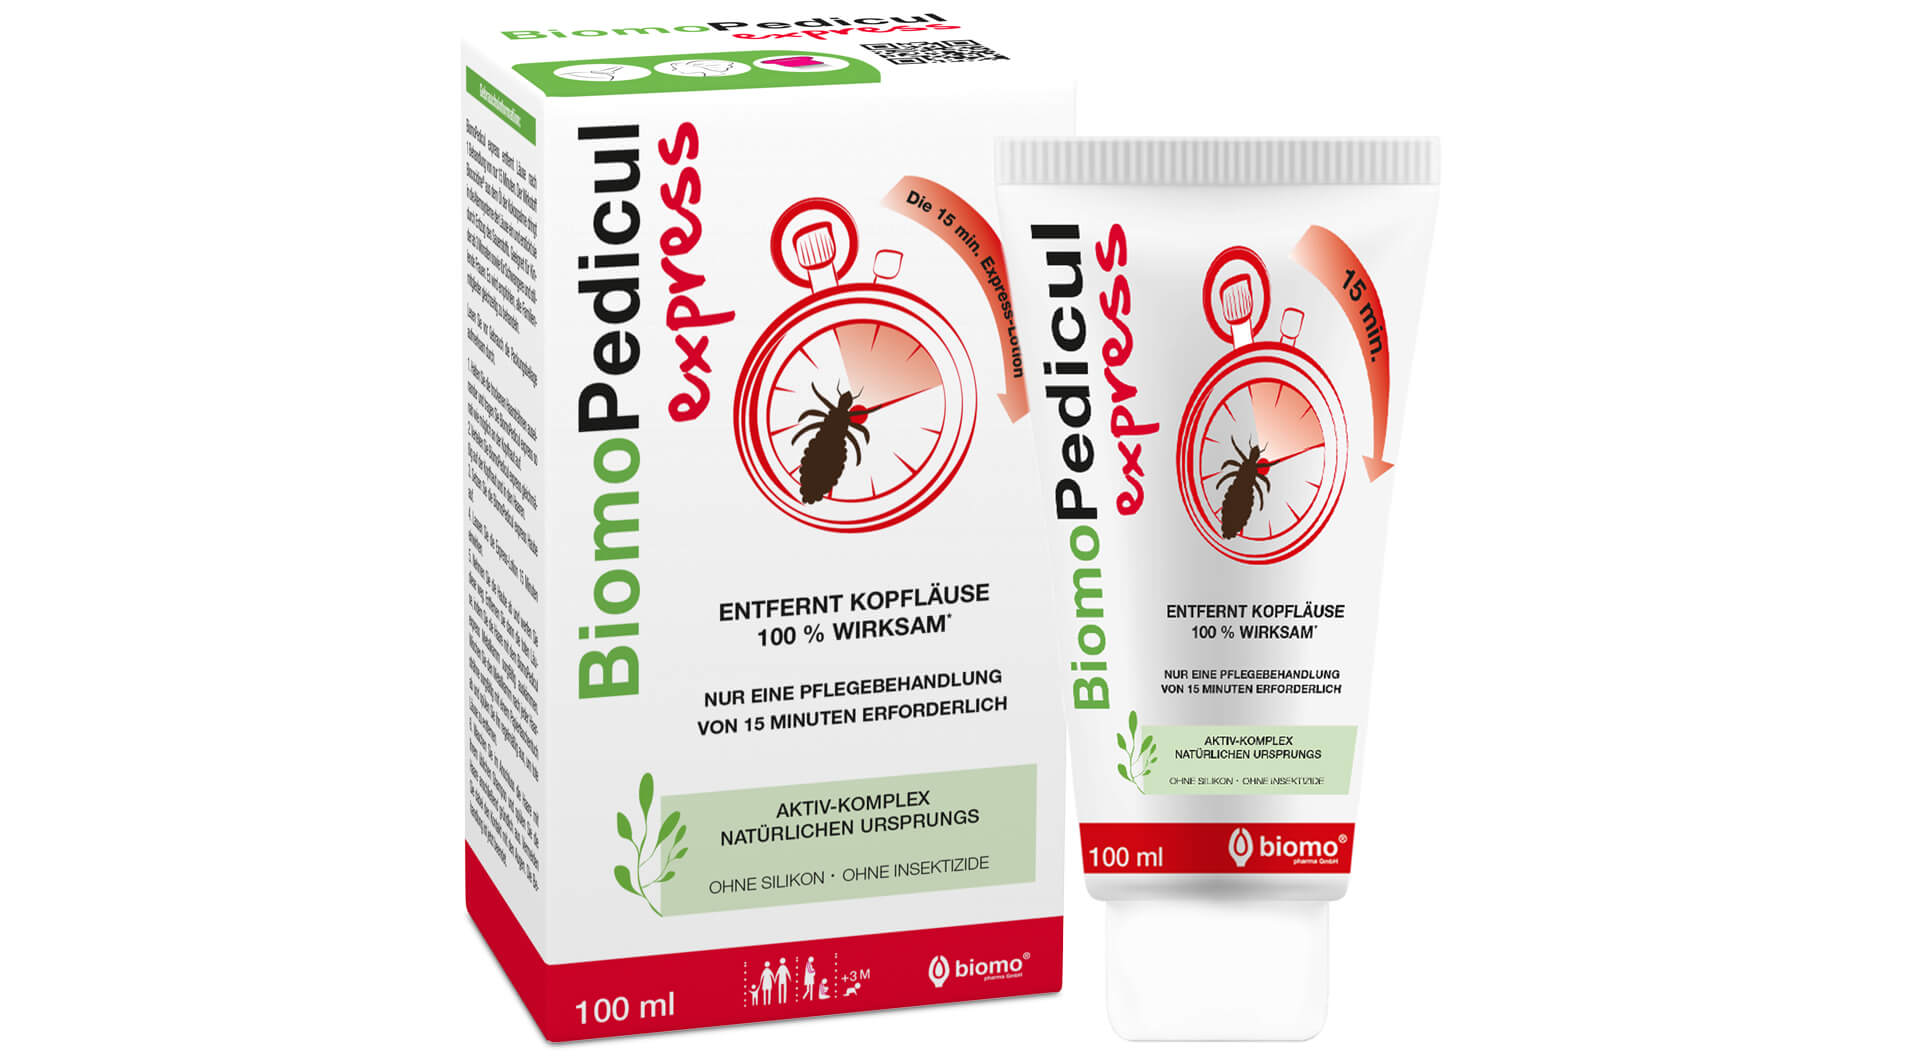 BiomoPedicul express